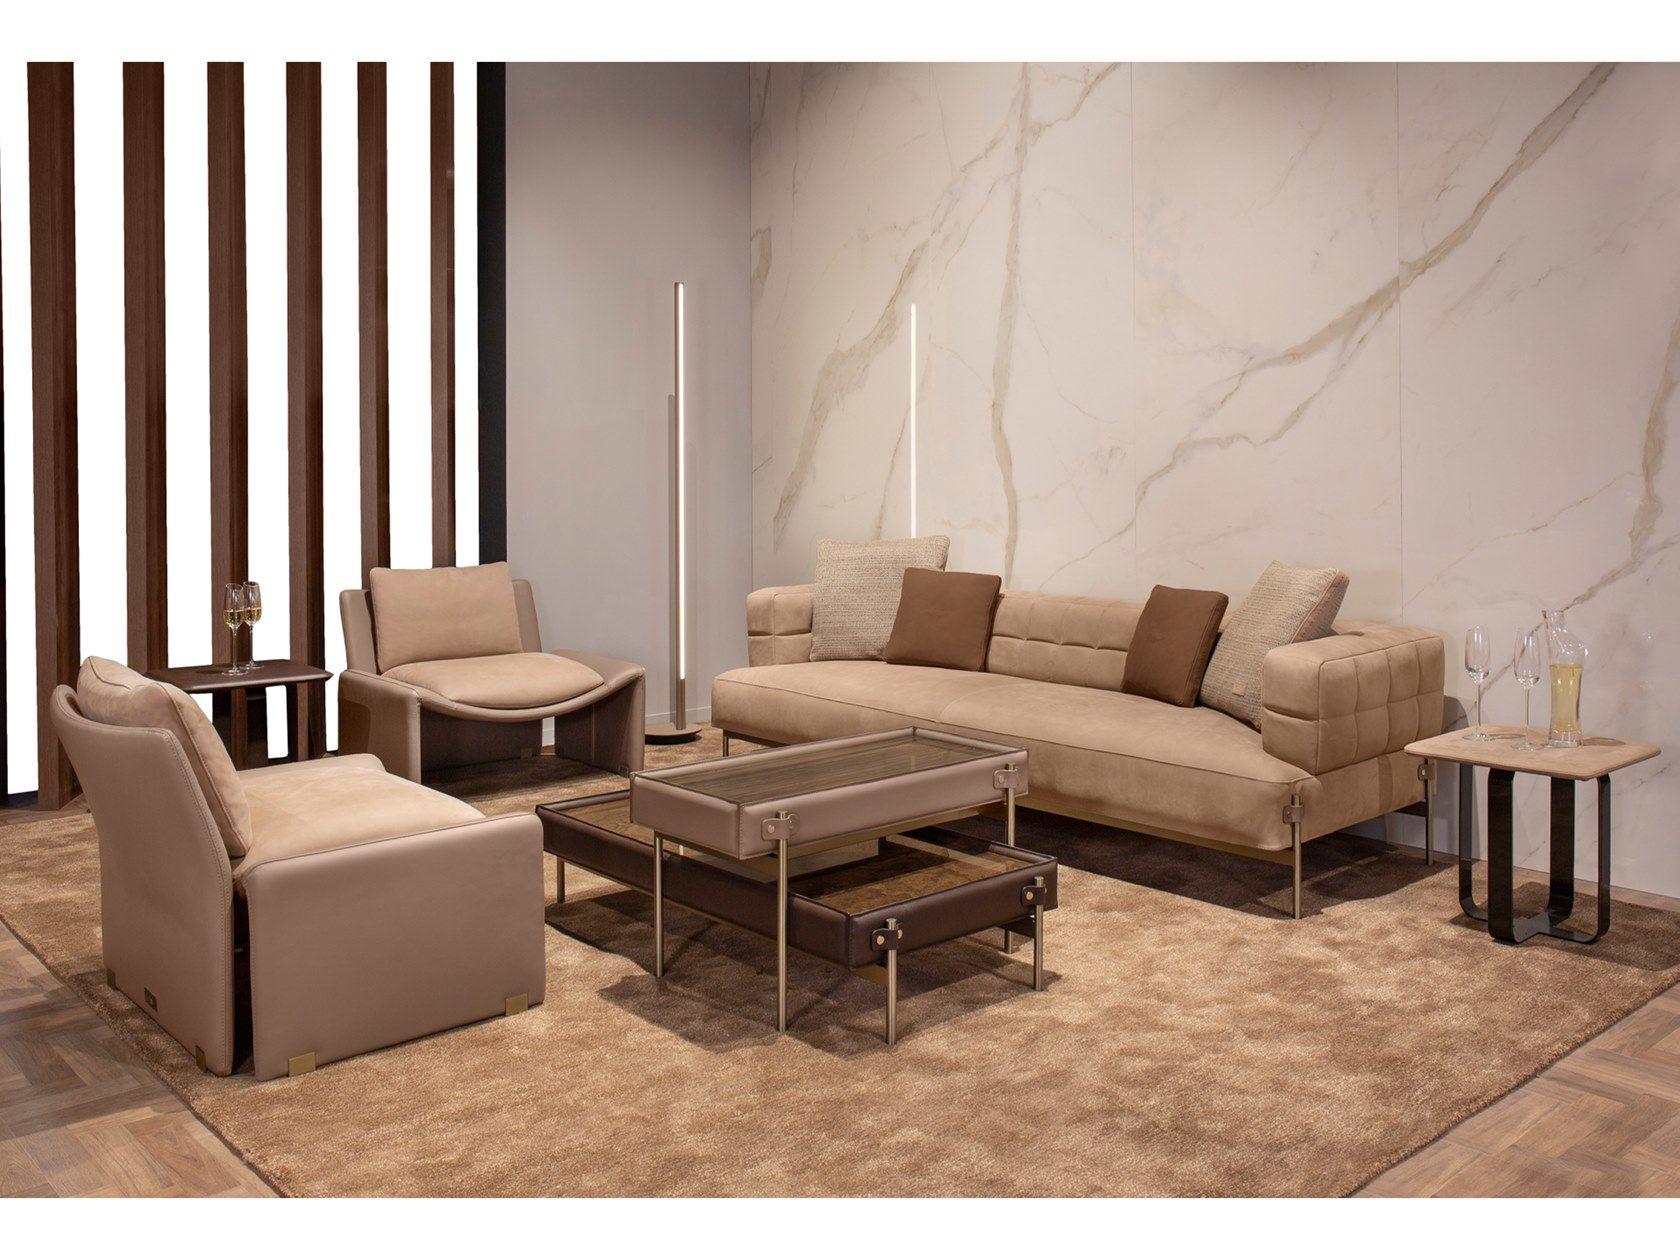 2020 Newest Modern Italian Sofa In 2020 Furniture Design Living Room Luxury Velvet Sofa Italian Sofa